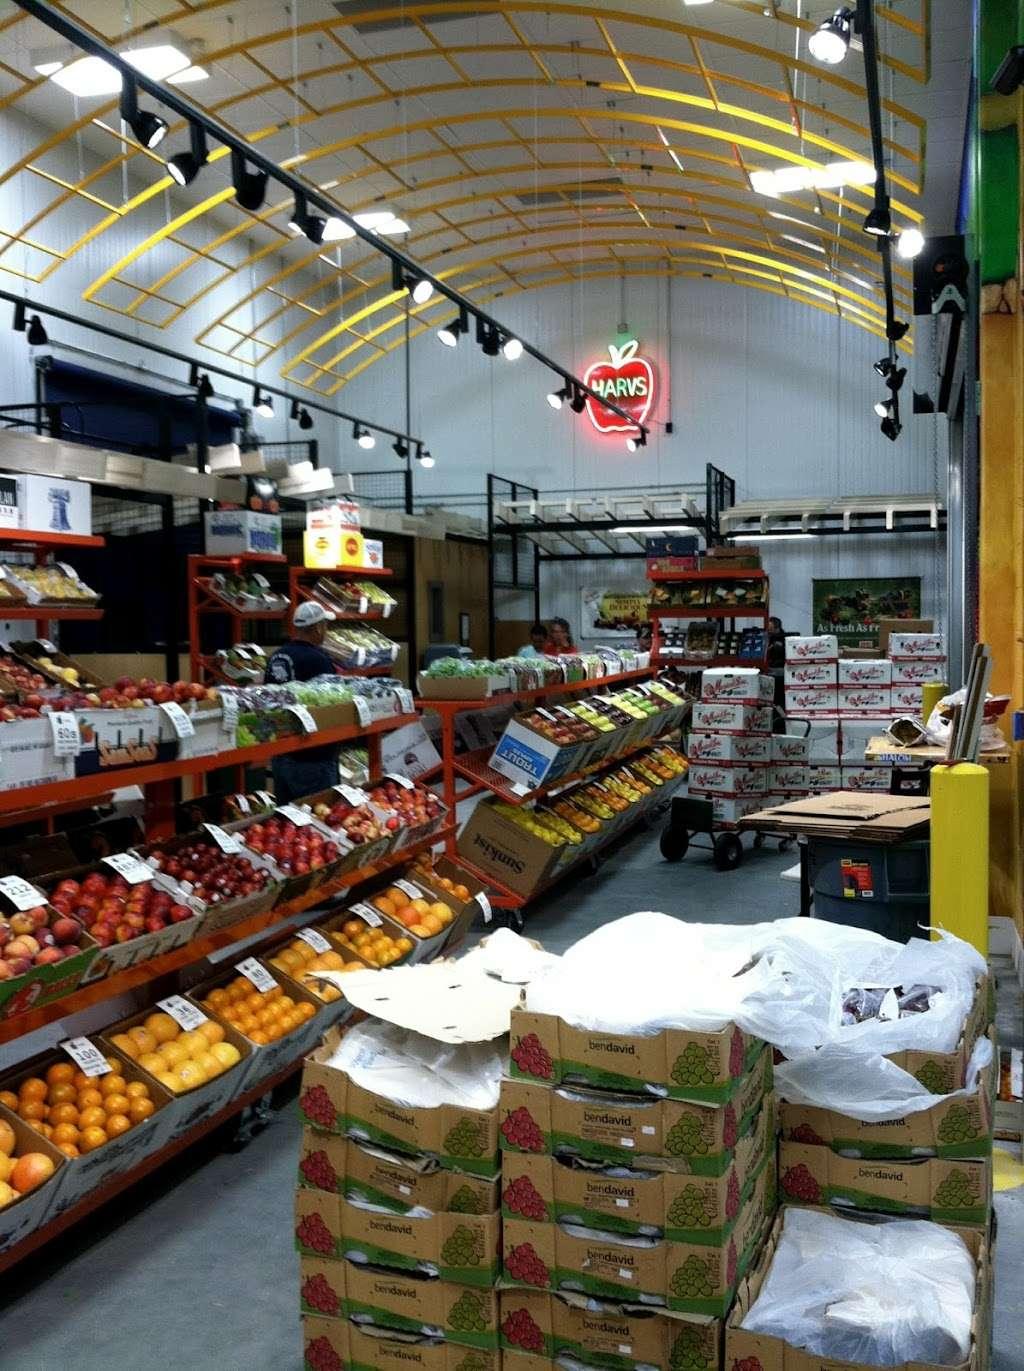 T. M. Kovacevich Wholesale Fruit and Produce - store  | Photo 1 of 10 | Address: 6700 Essington Ave, Philadelphia, PA 19153, USA | Phone: (215) 336-3160